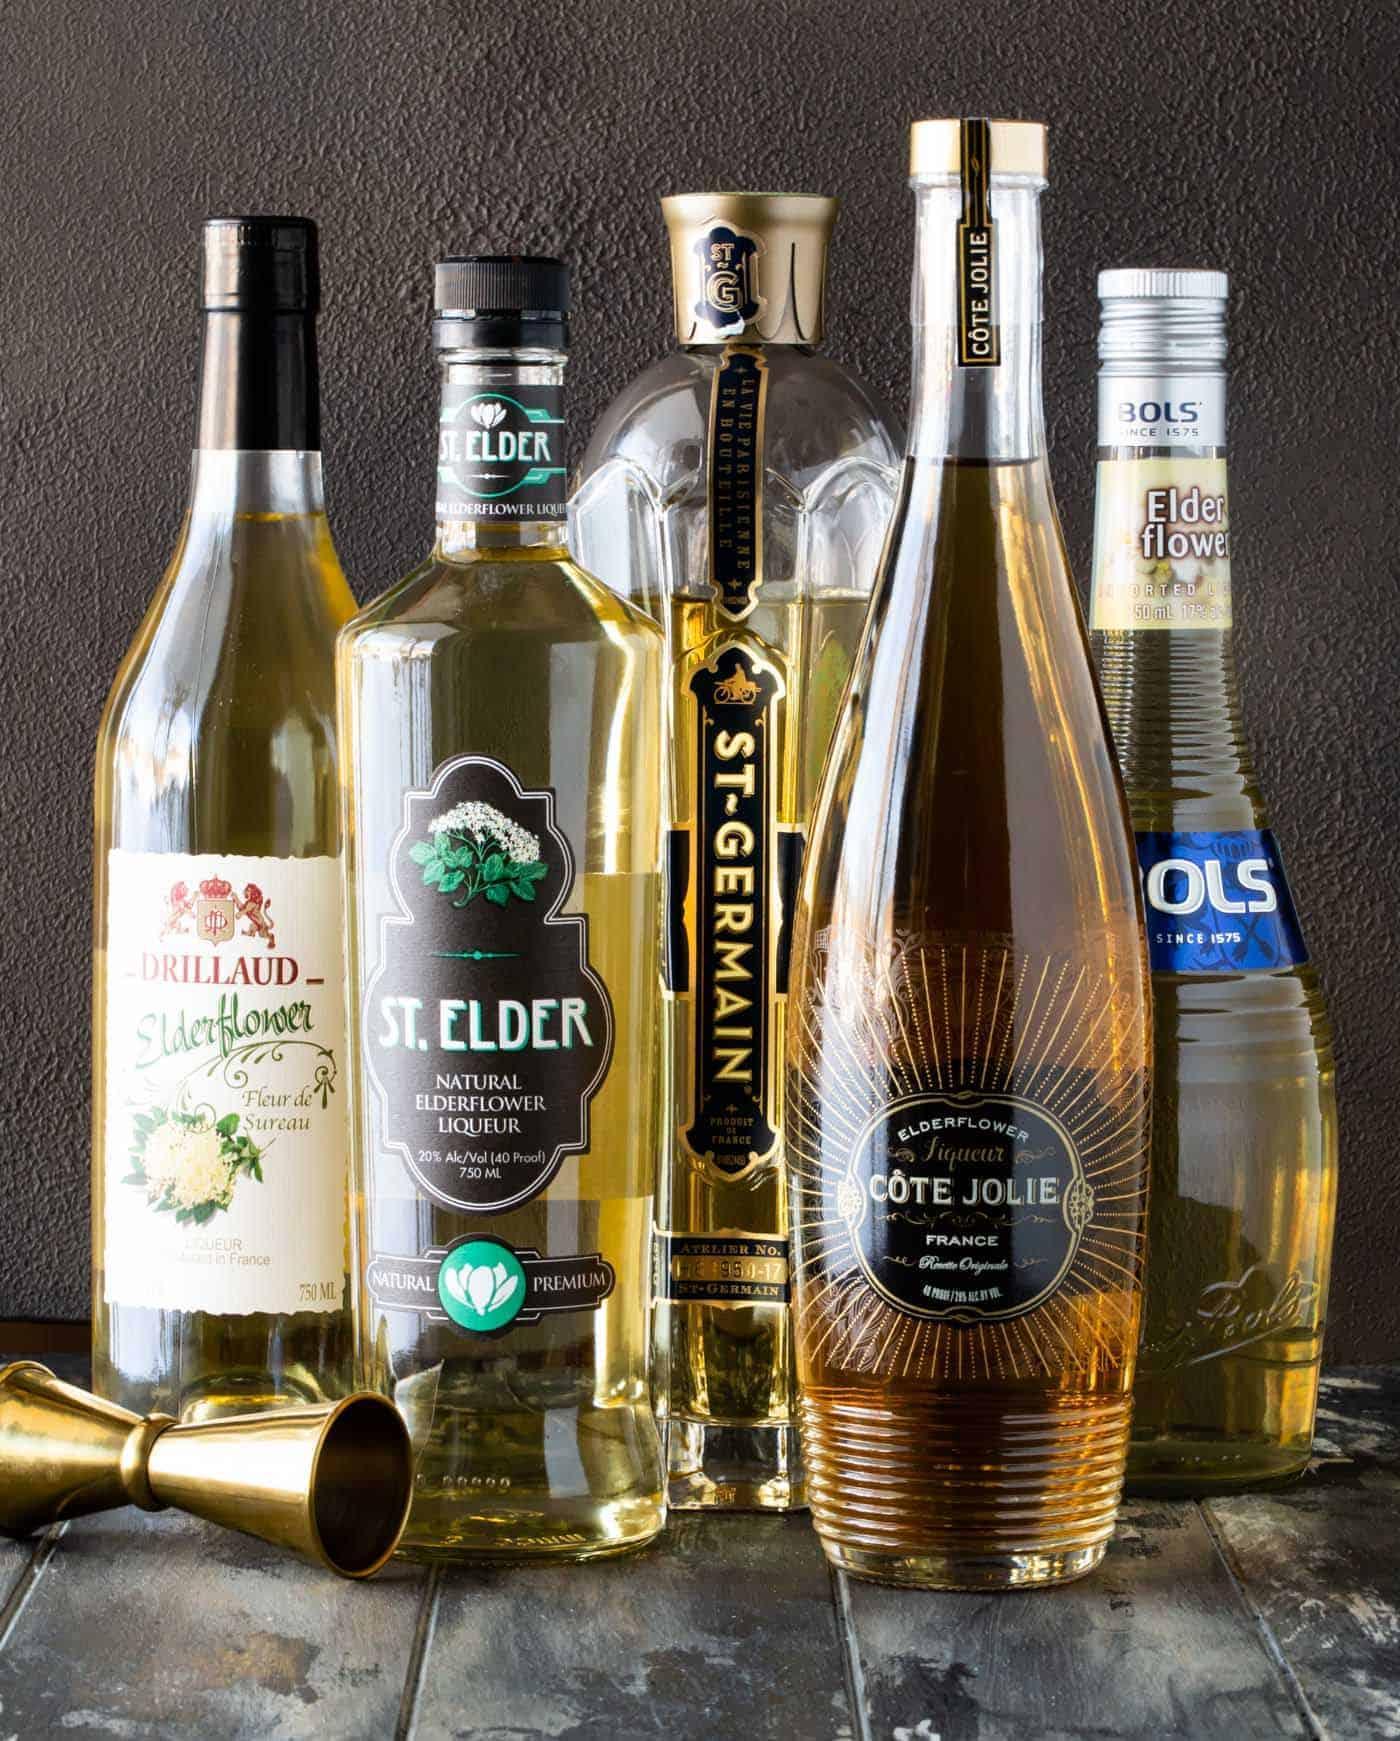 Bottles of different brands of elderflower liqueur with gold jigger